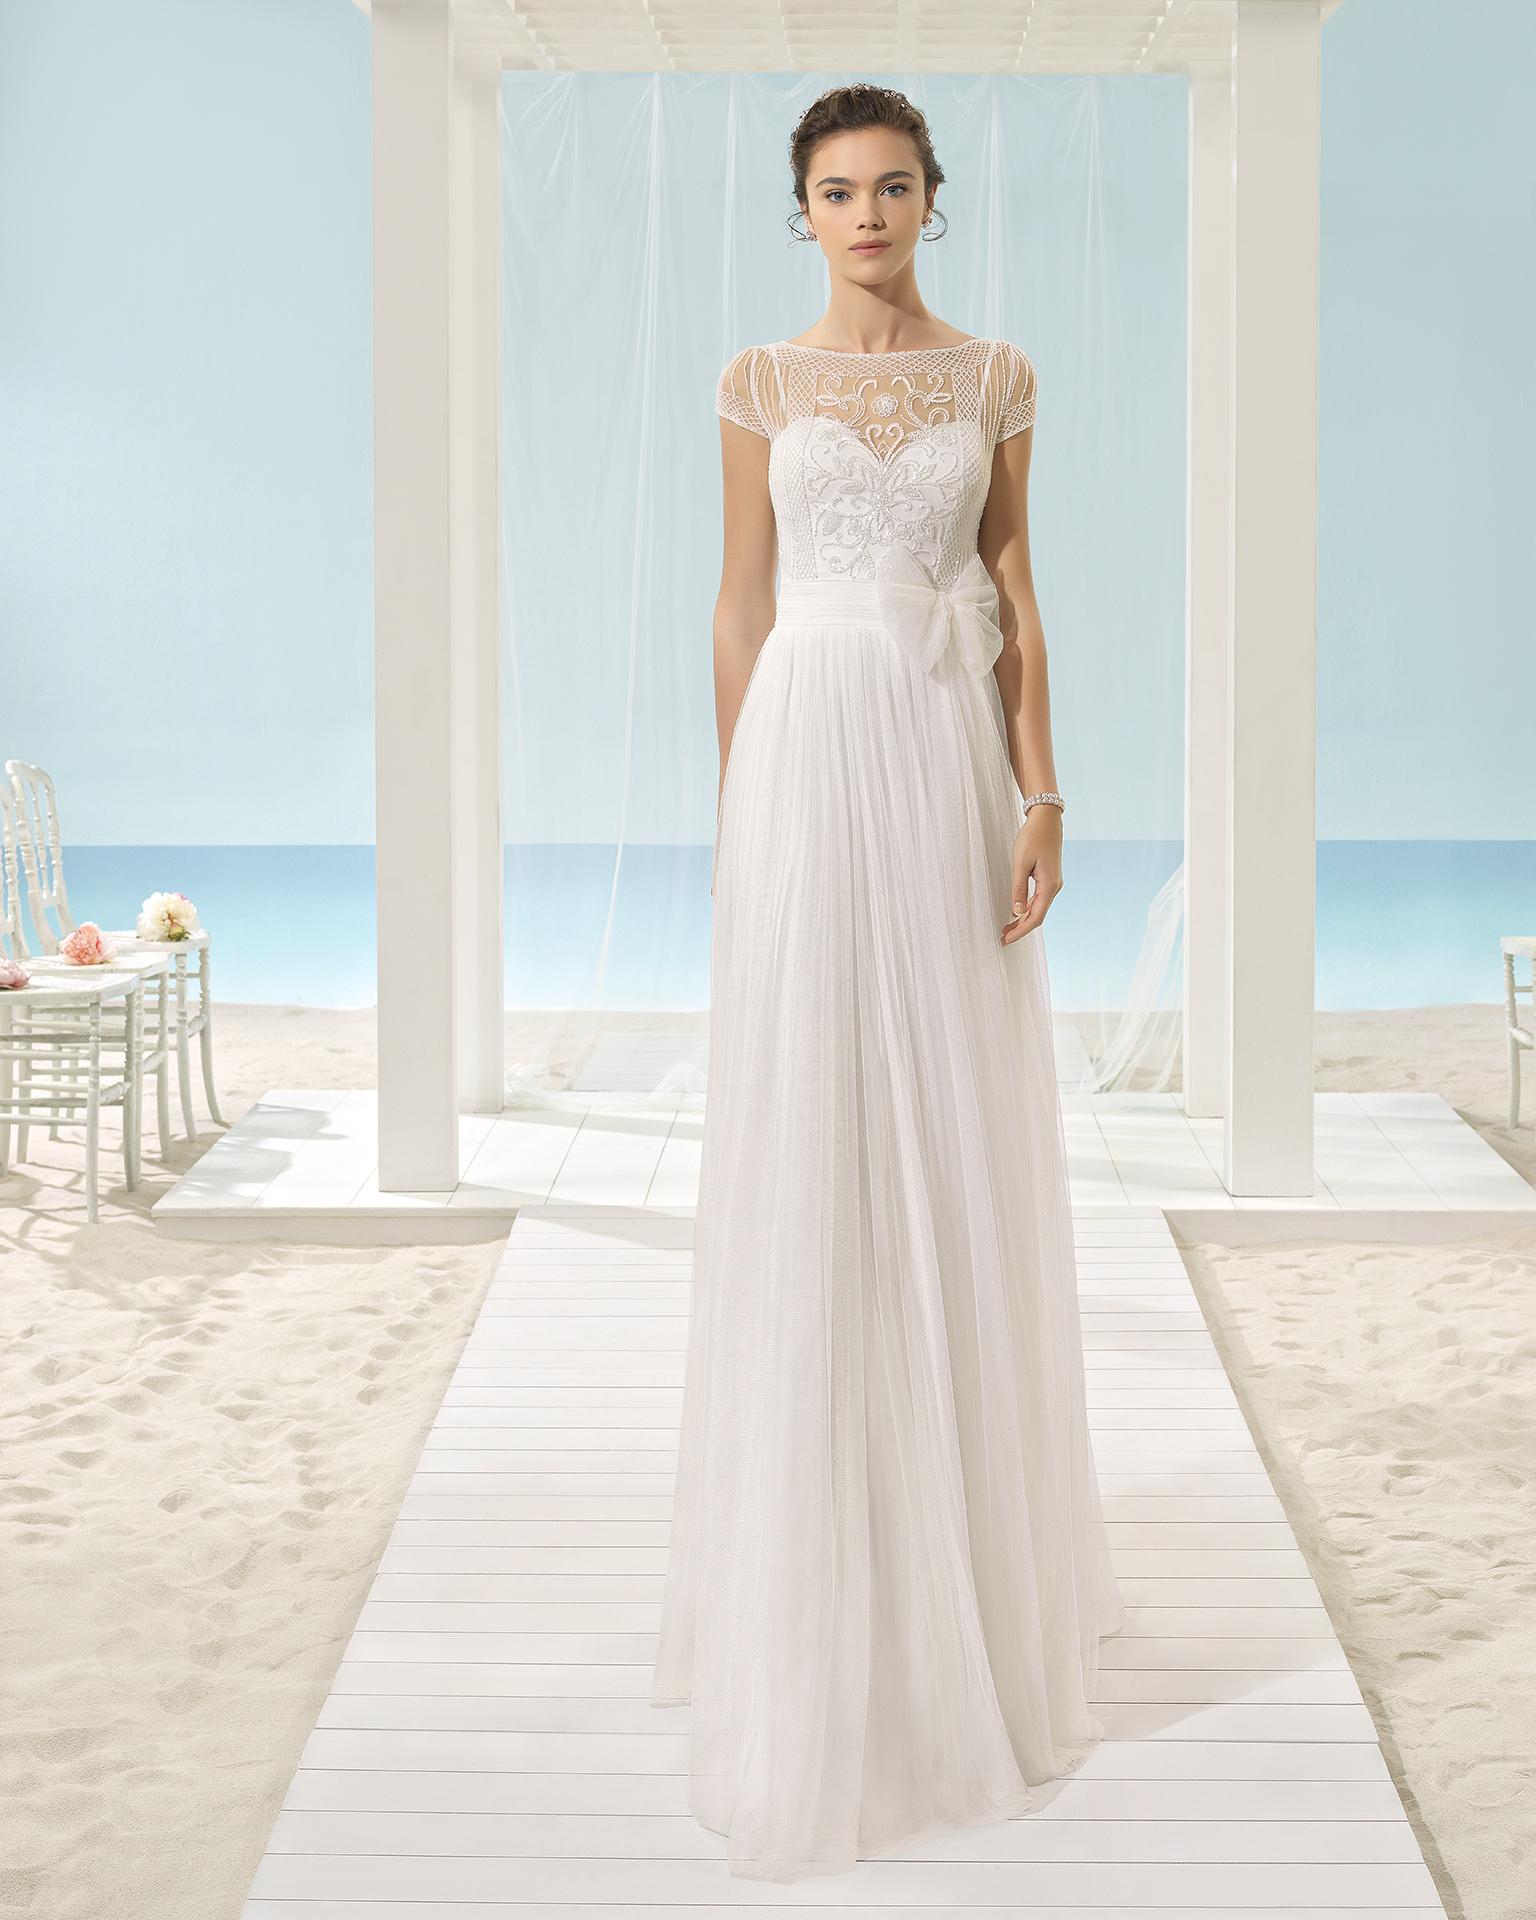 XENOP wedding dress - Aire Barcelona Beach Wedding 2017